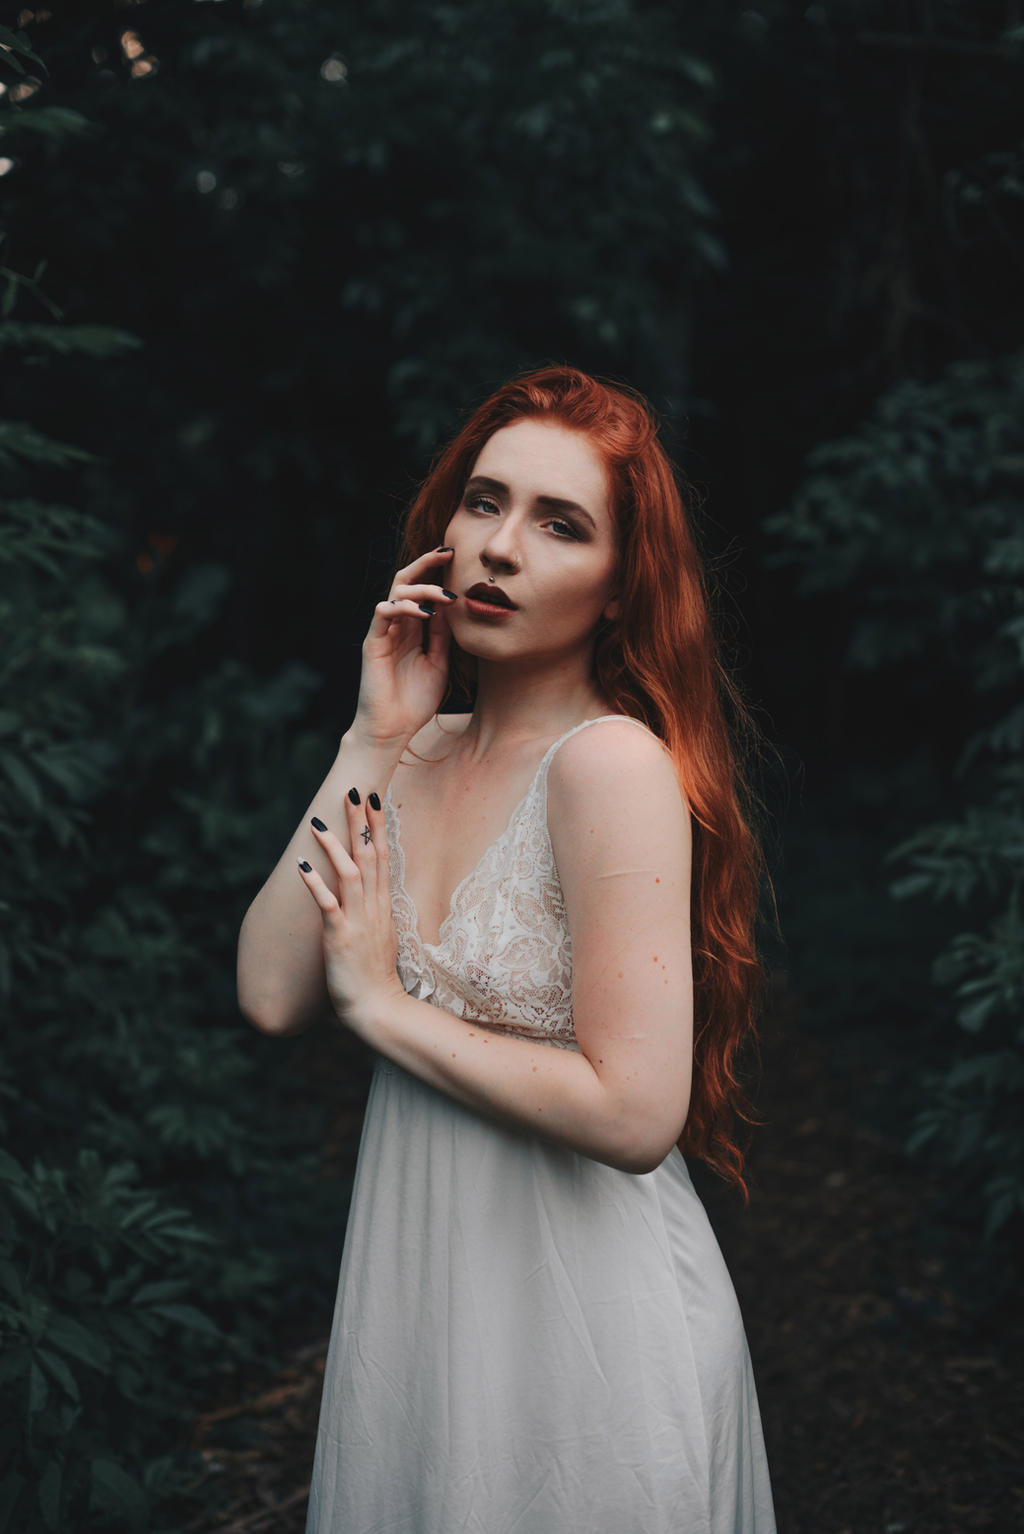 remnants by JenovaxLilith